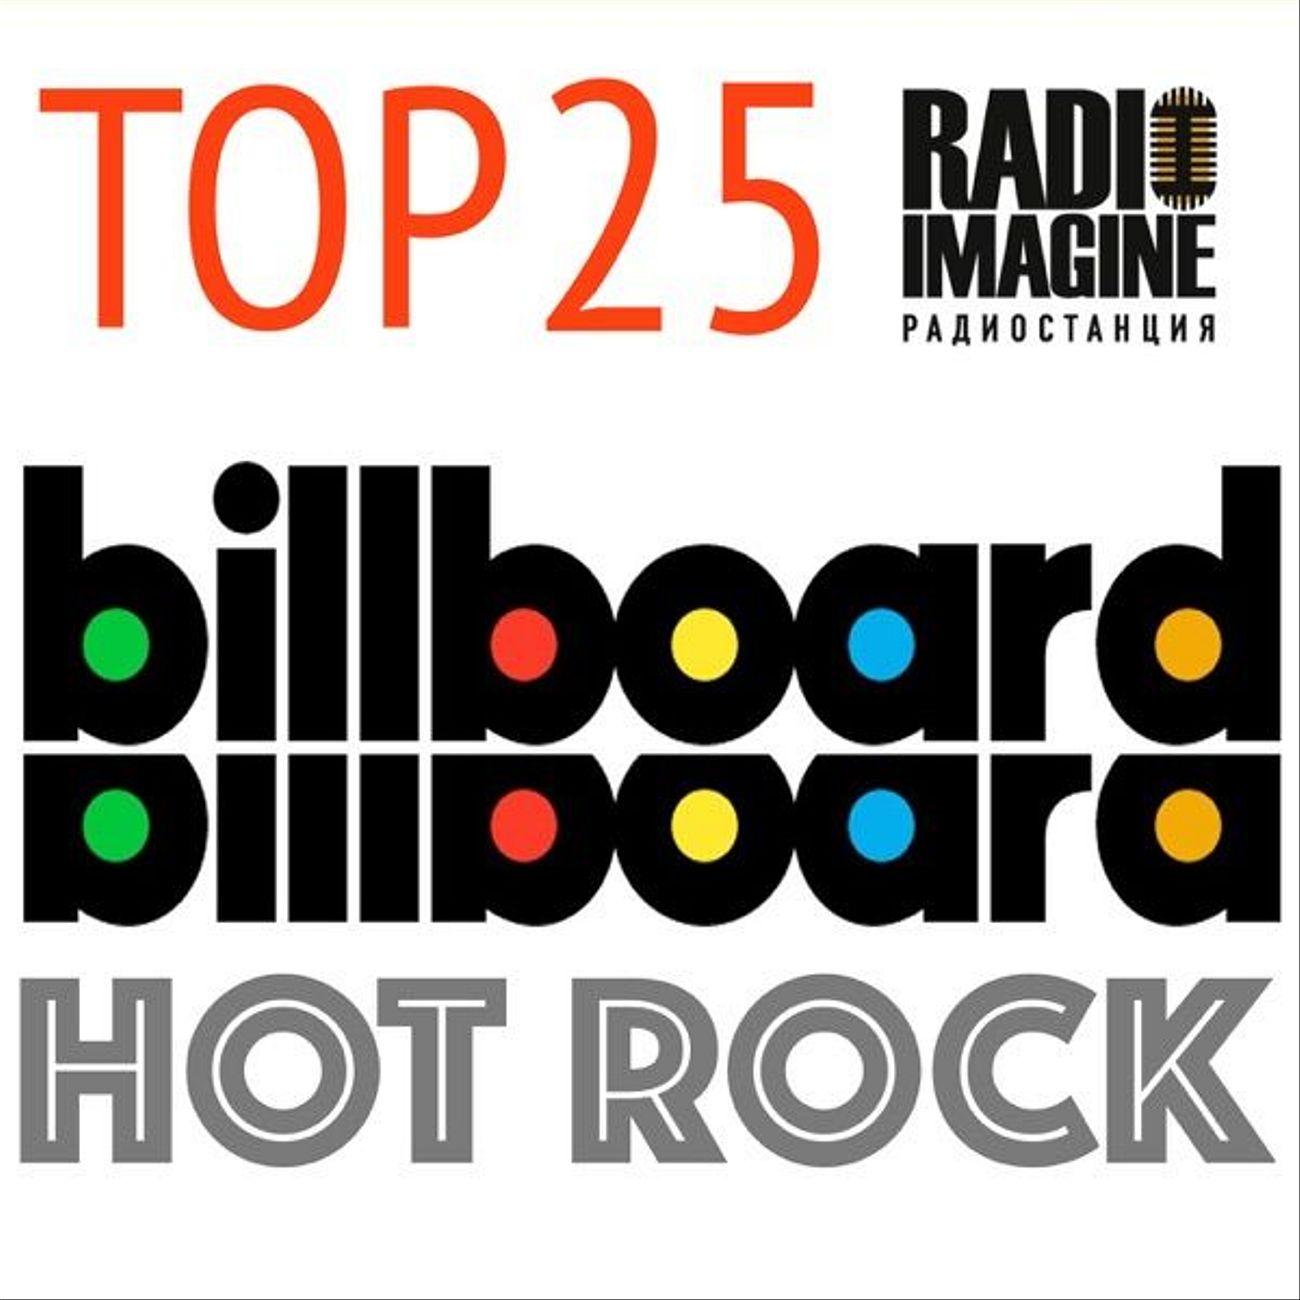 TOP 25 BILLBOARD ROCK HITS